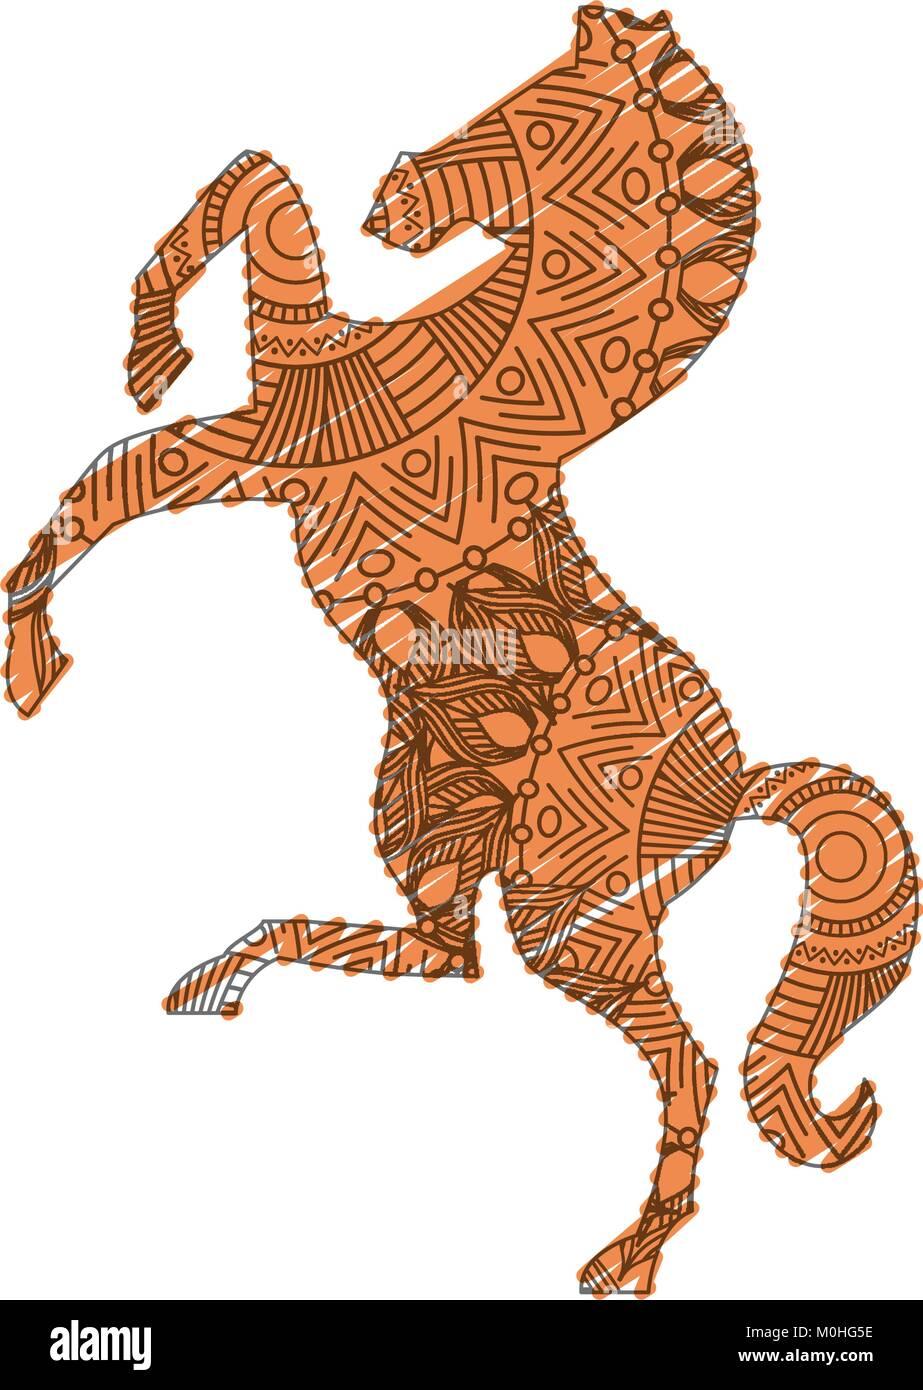 Hand Drawn Horse Vector Illustration Stockfotos & Hand Drawn Horse ...